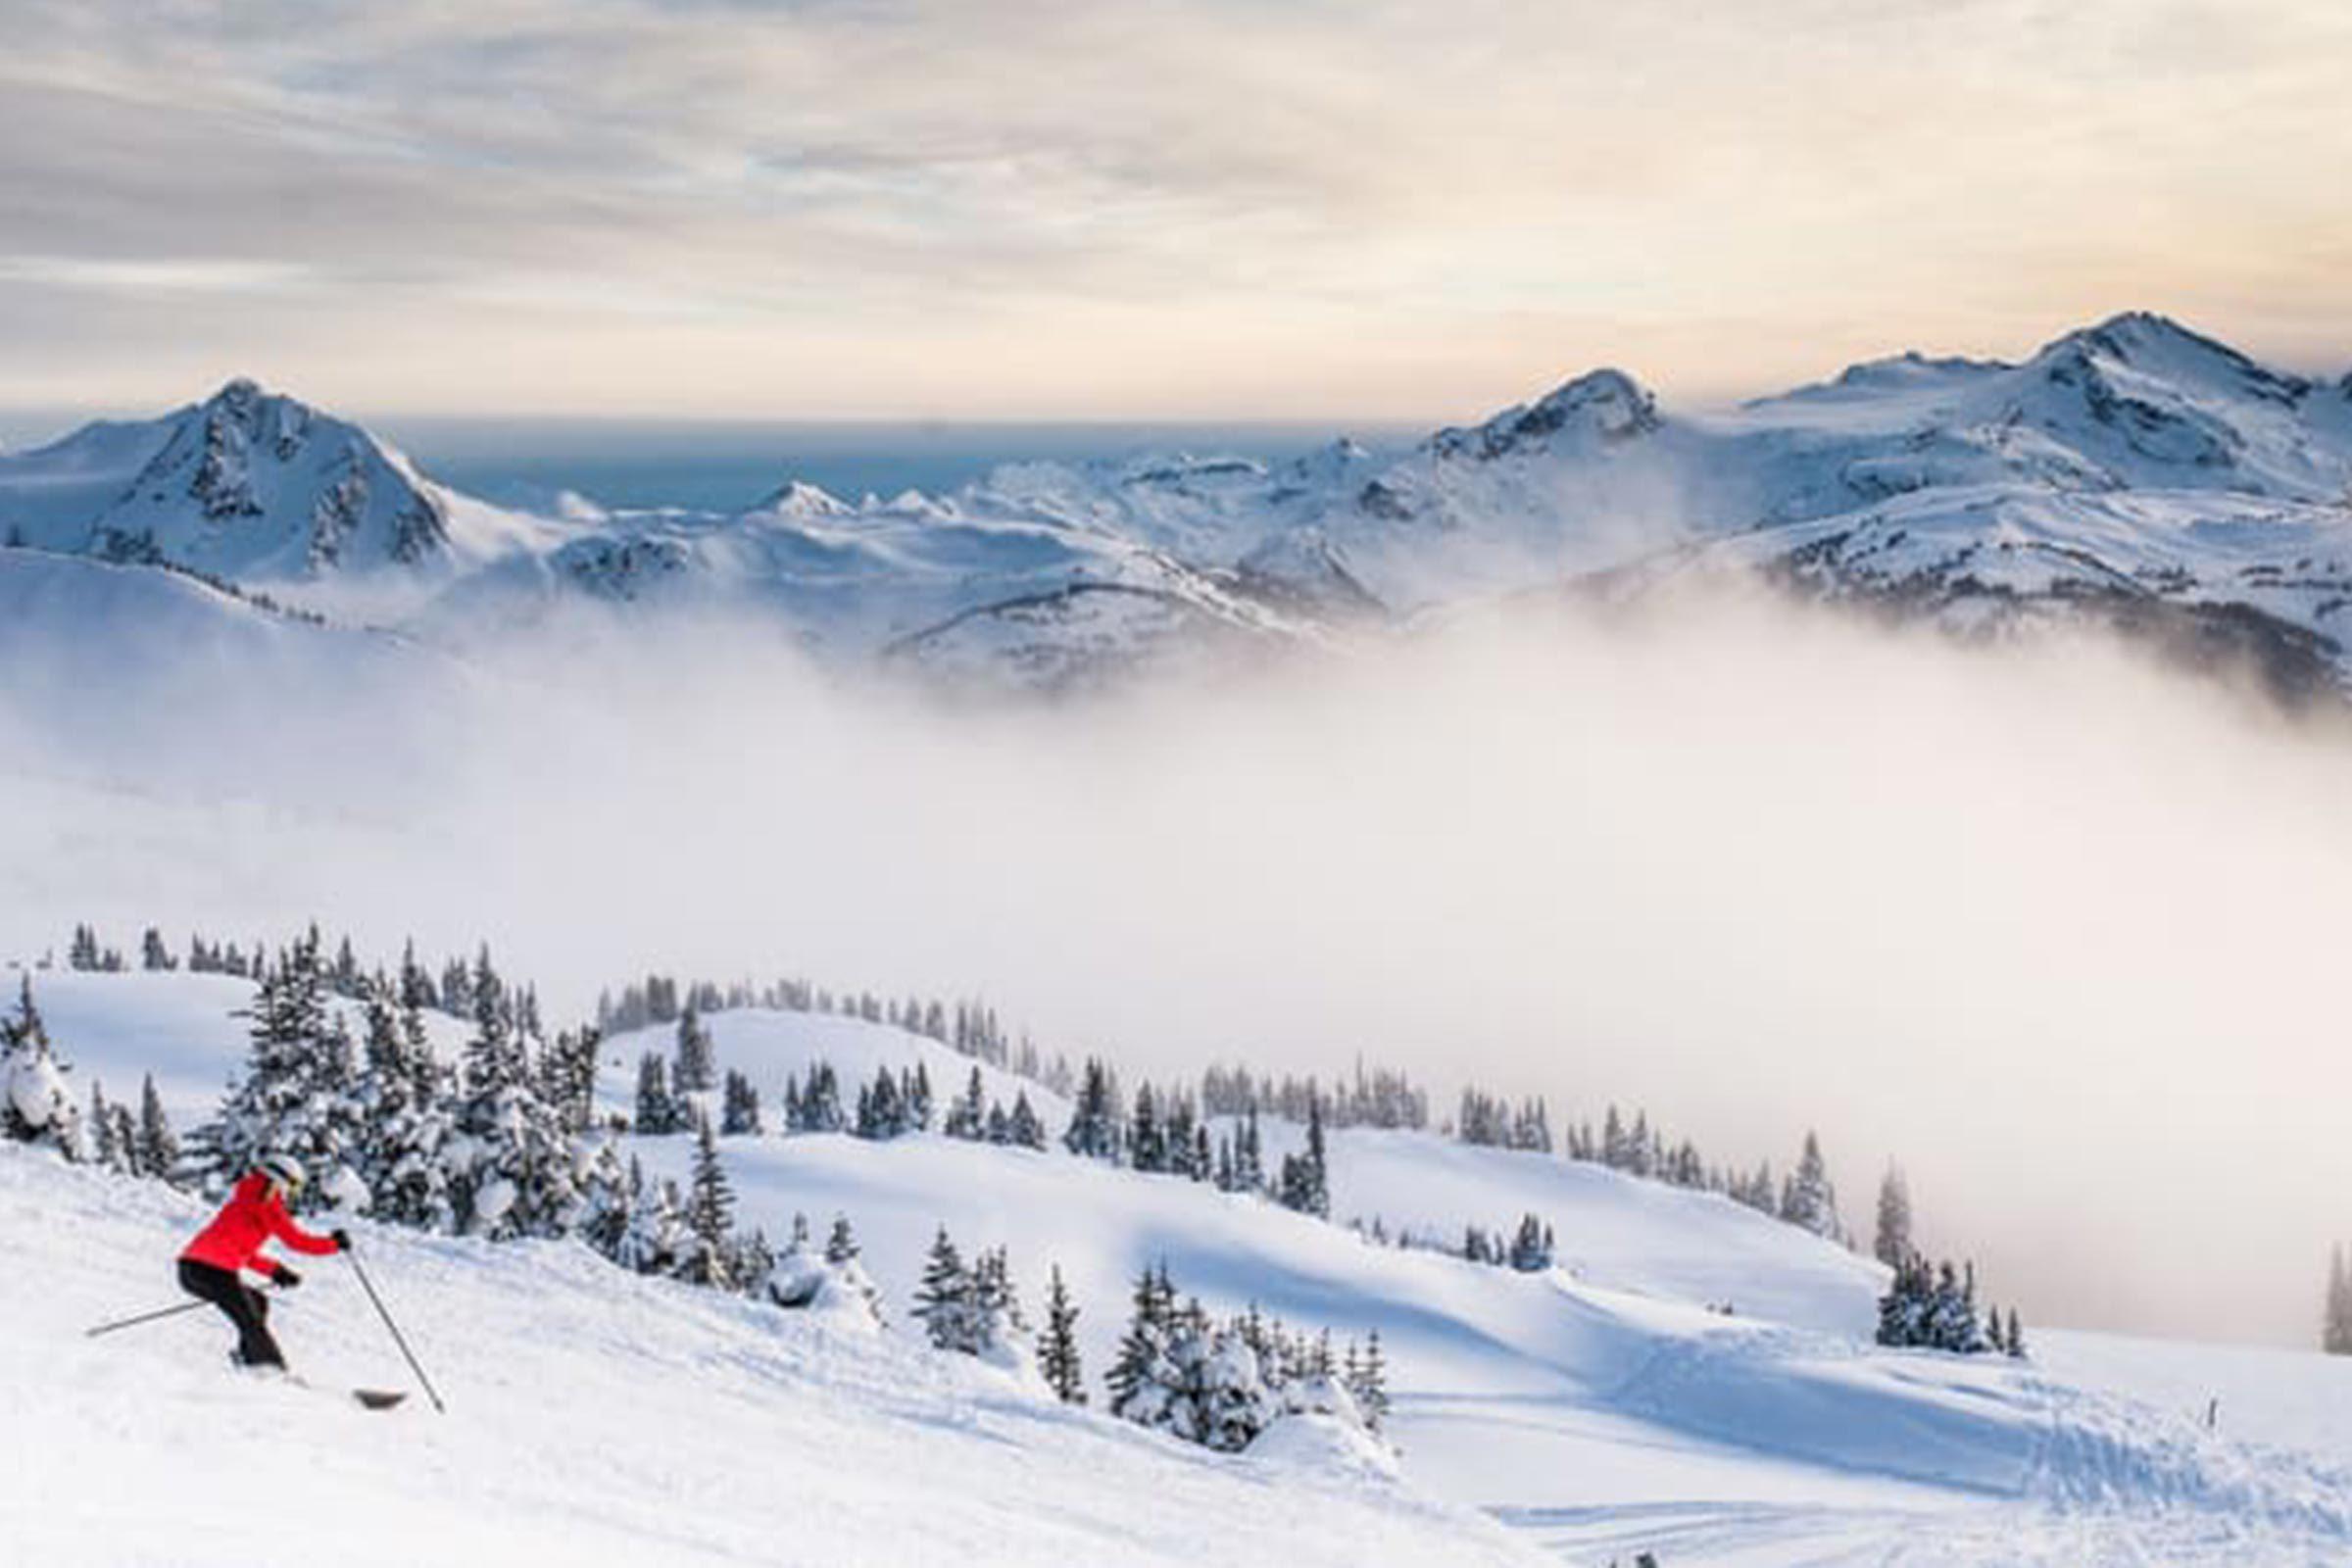 13 Ski Resorts You Need to Visit in 2019